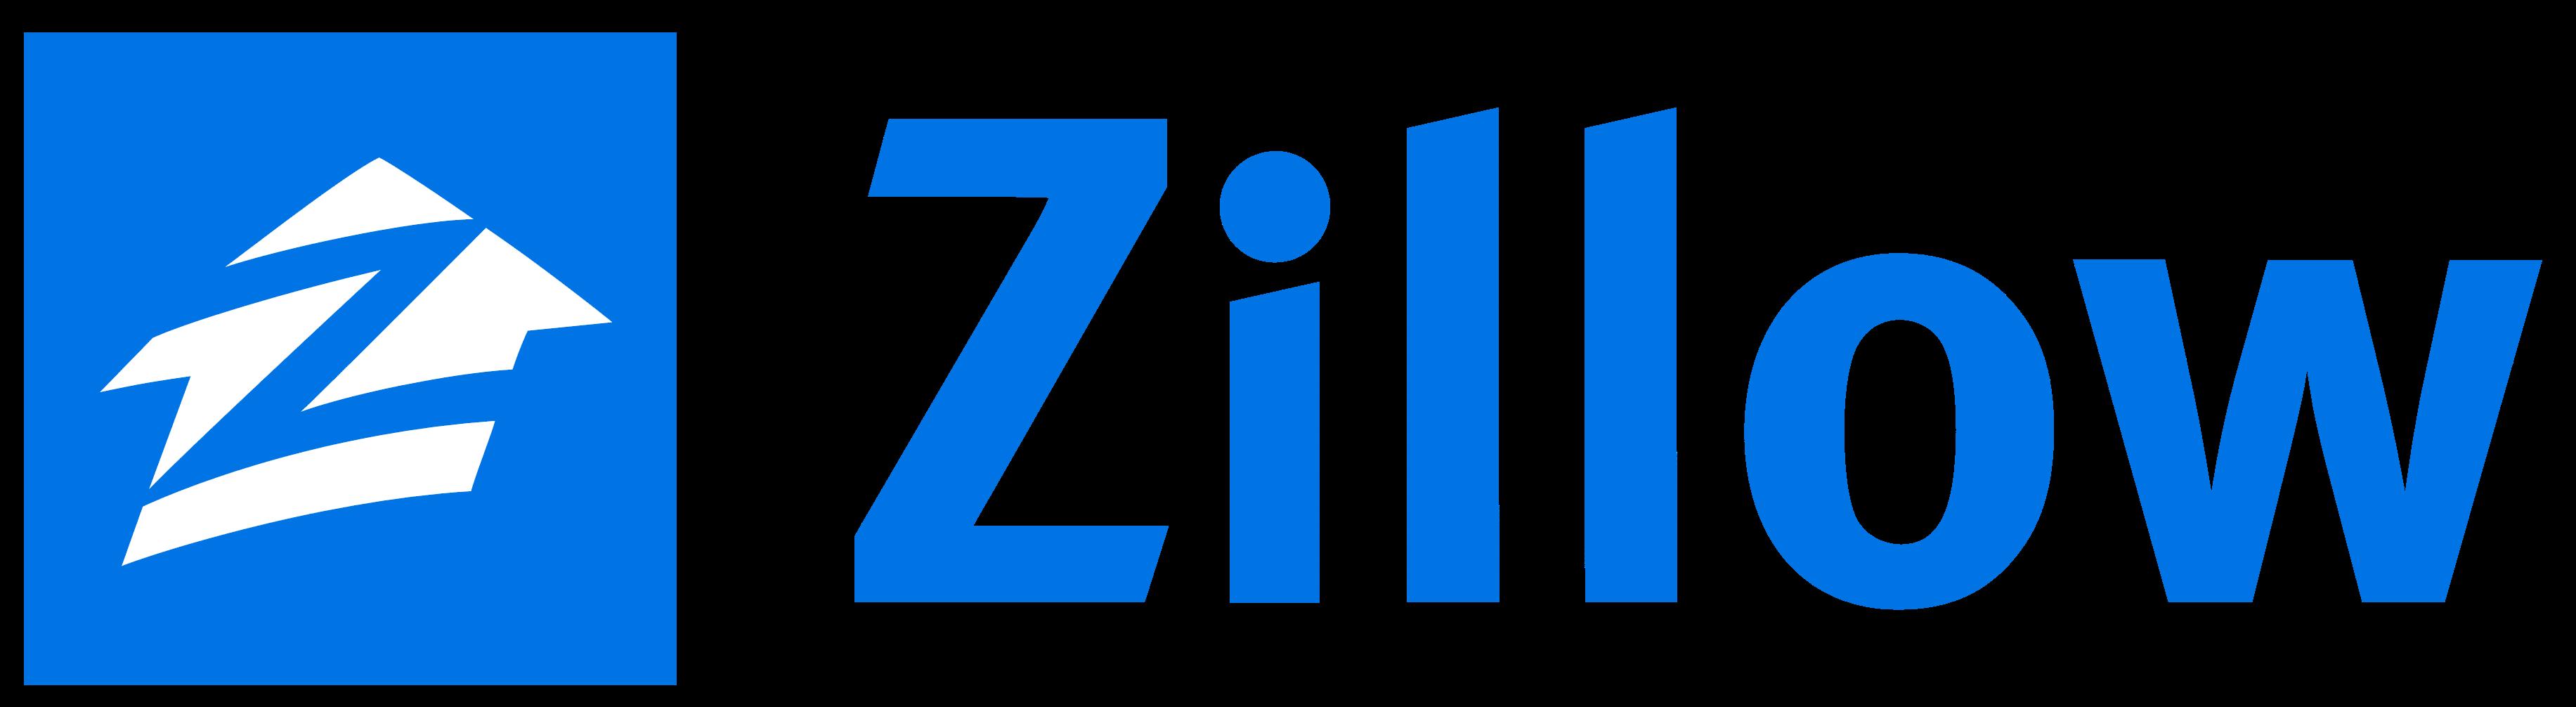 Zillow Zillow Com Logos Download